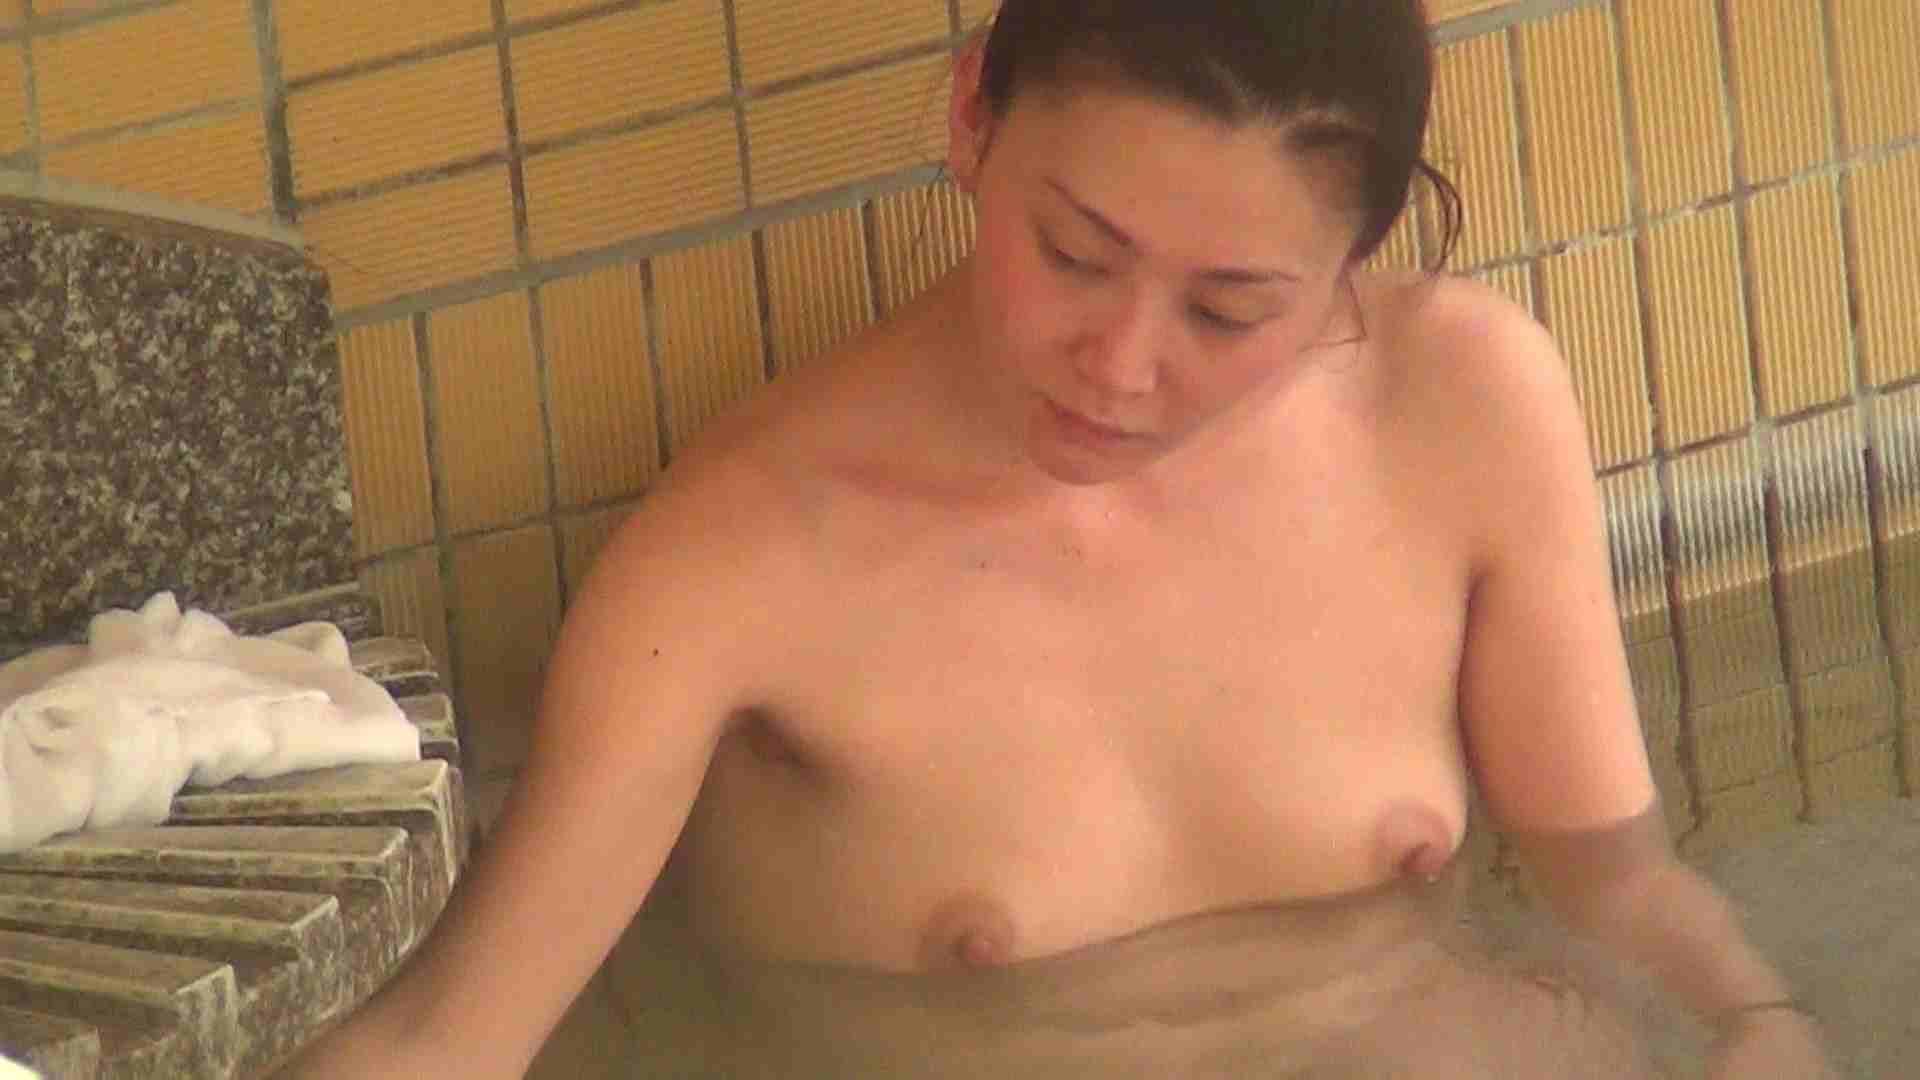 Aquaな露天風呂Vol.231 露天 スケベ動画紹介 113pic 31